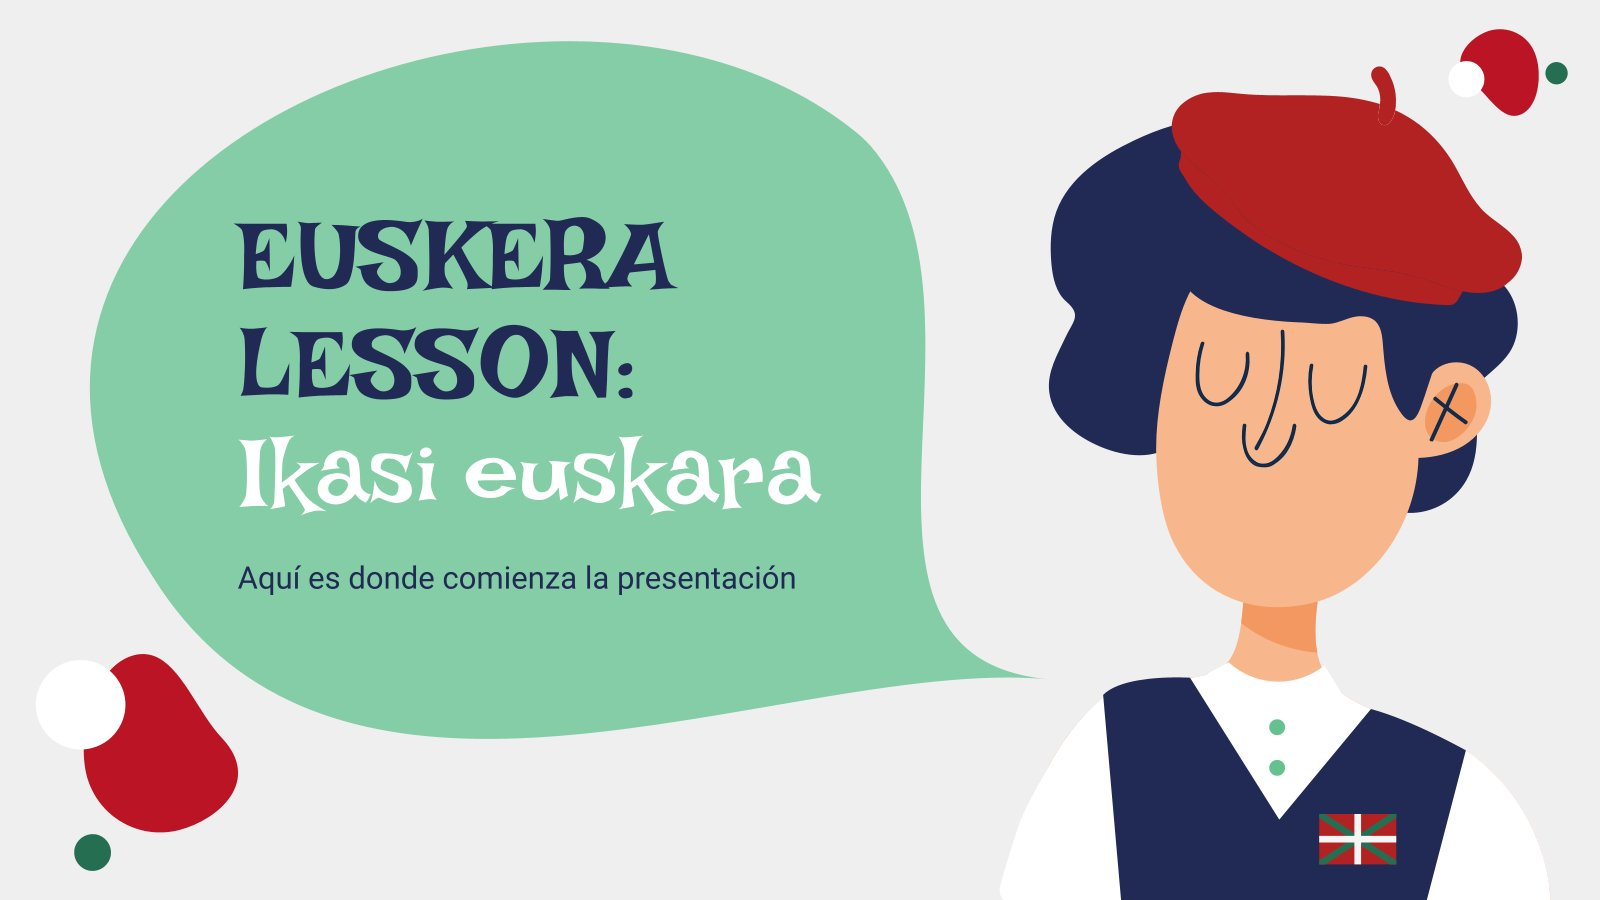 Euskera Lesson: Ikasi euskara presentation template